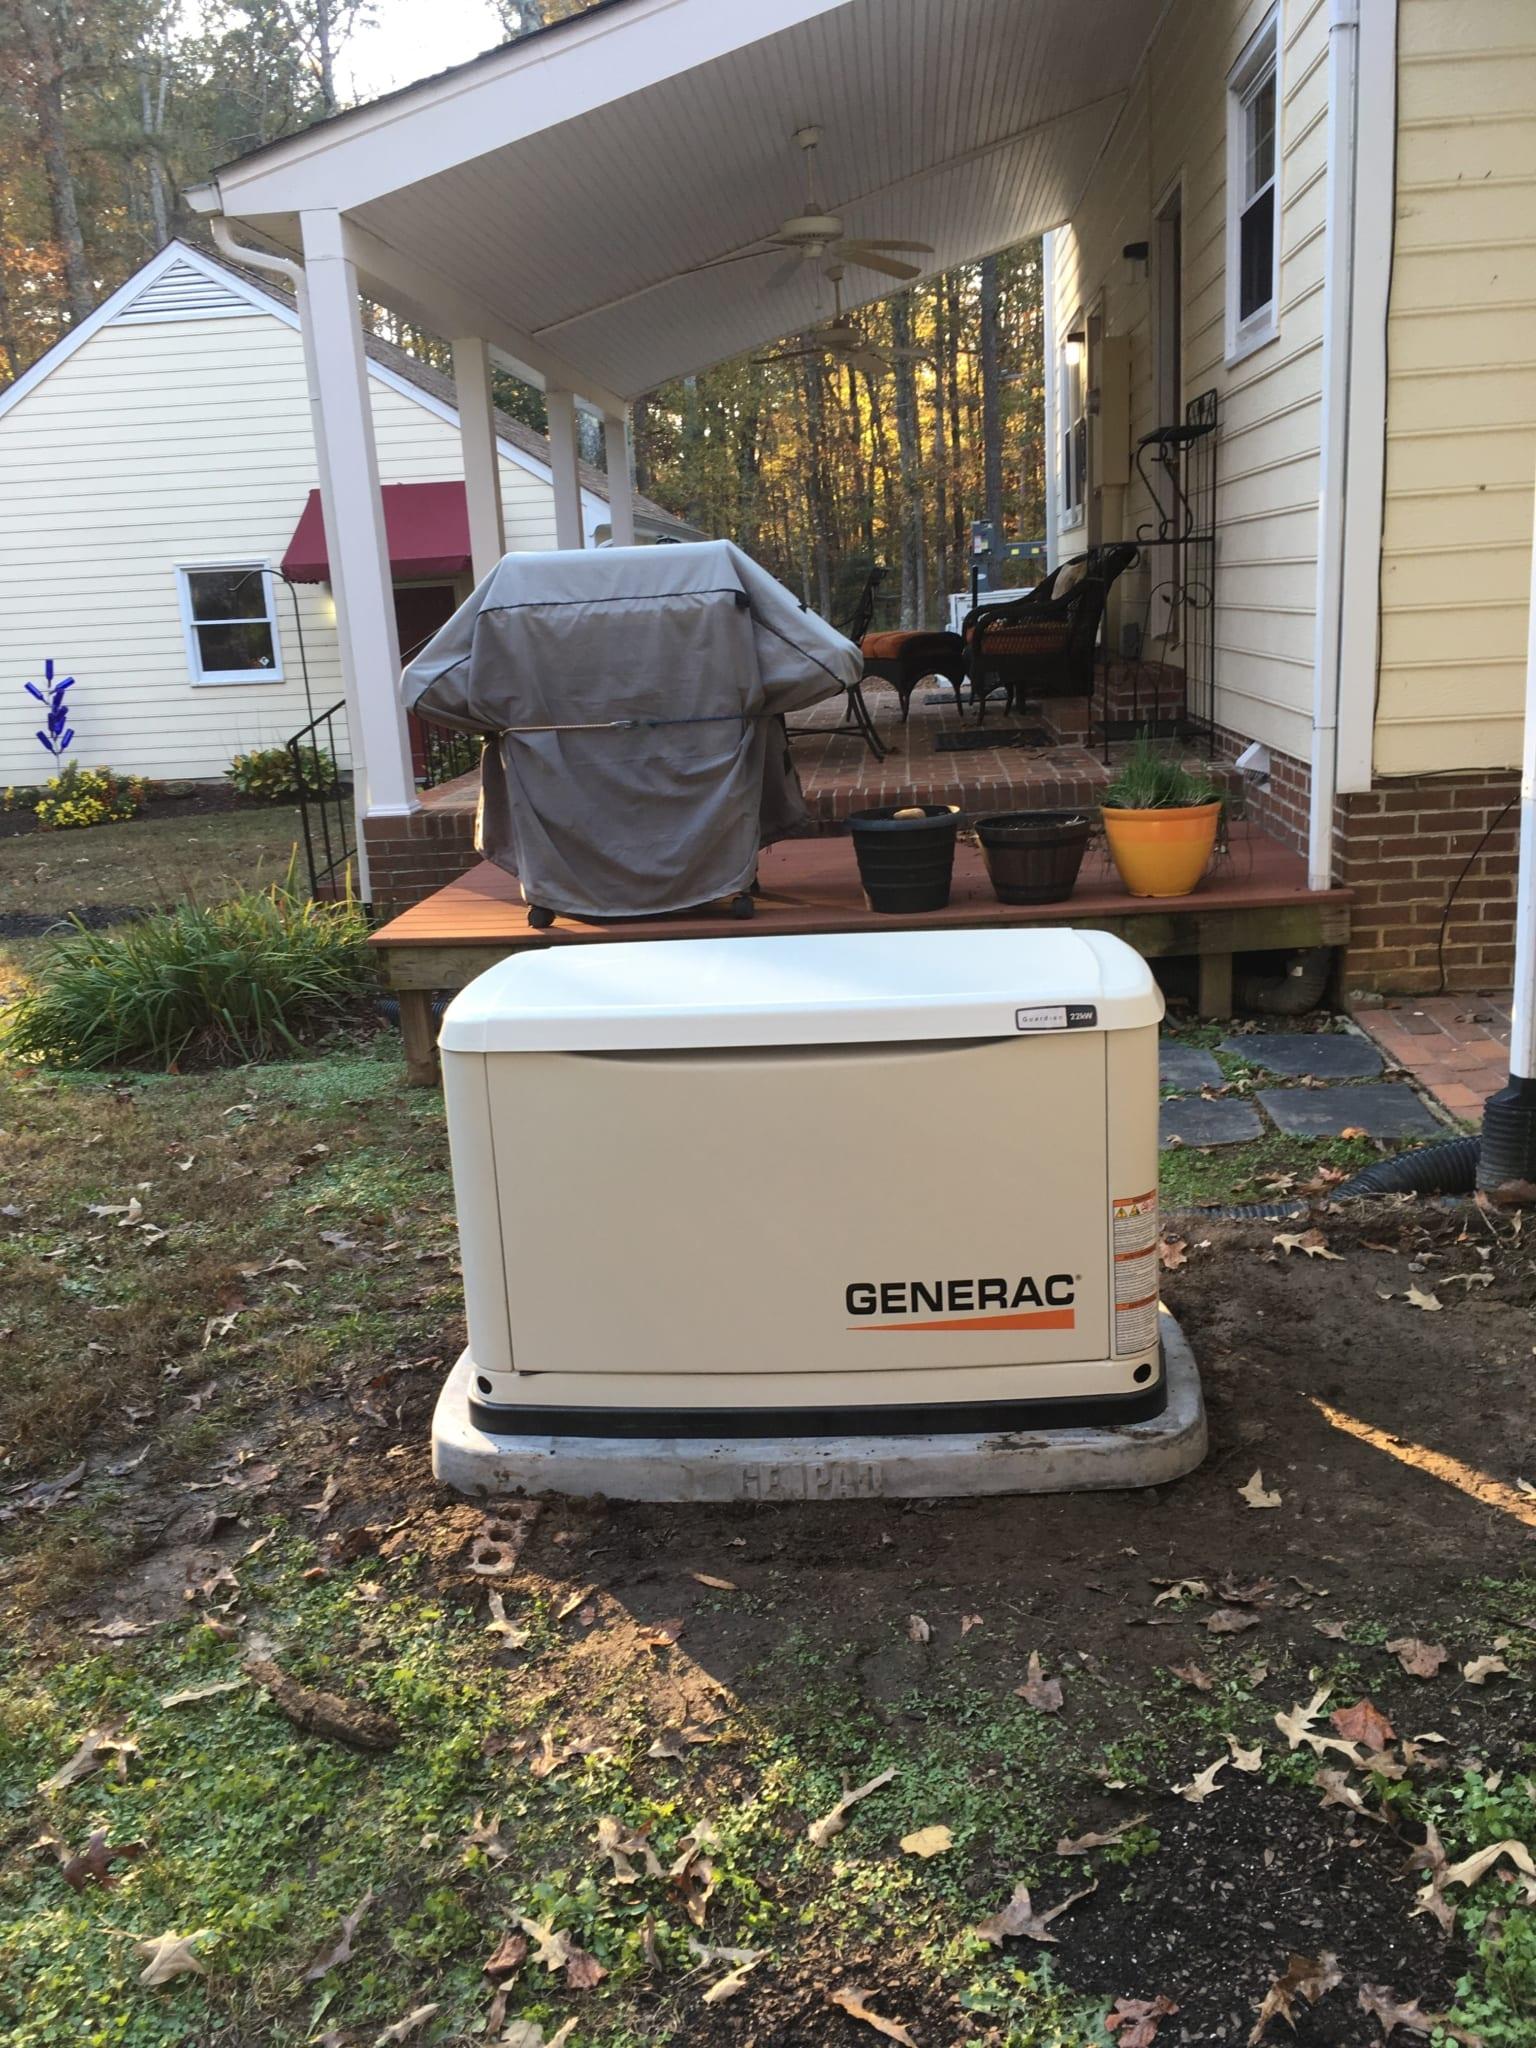 Generac Automatic Standby Generator